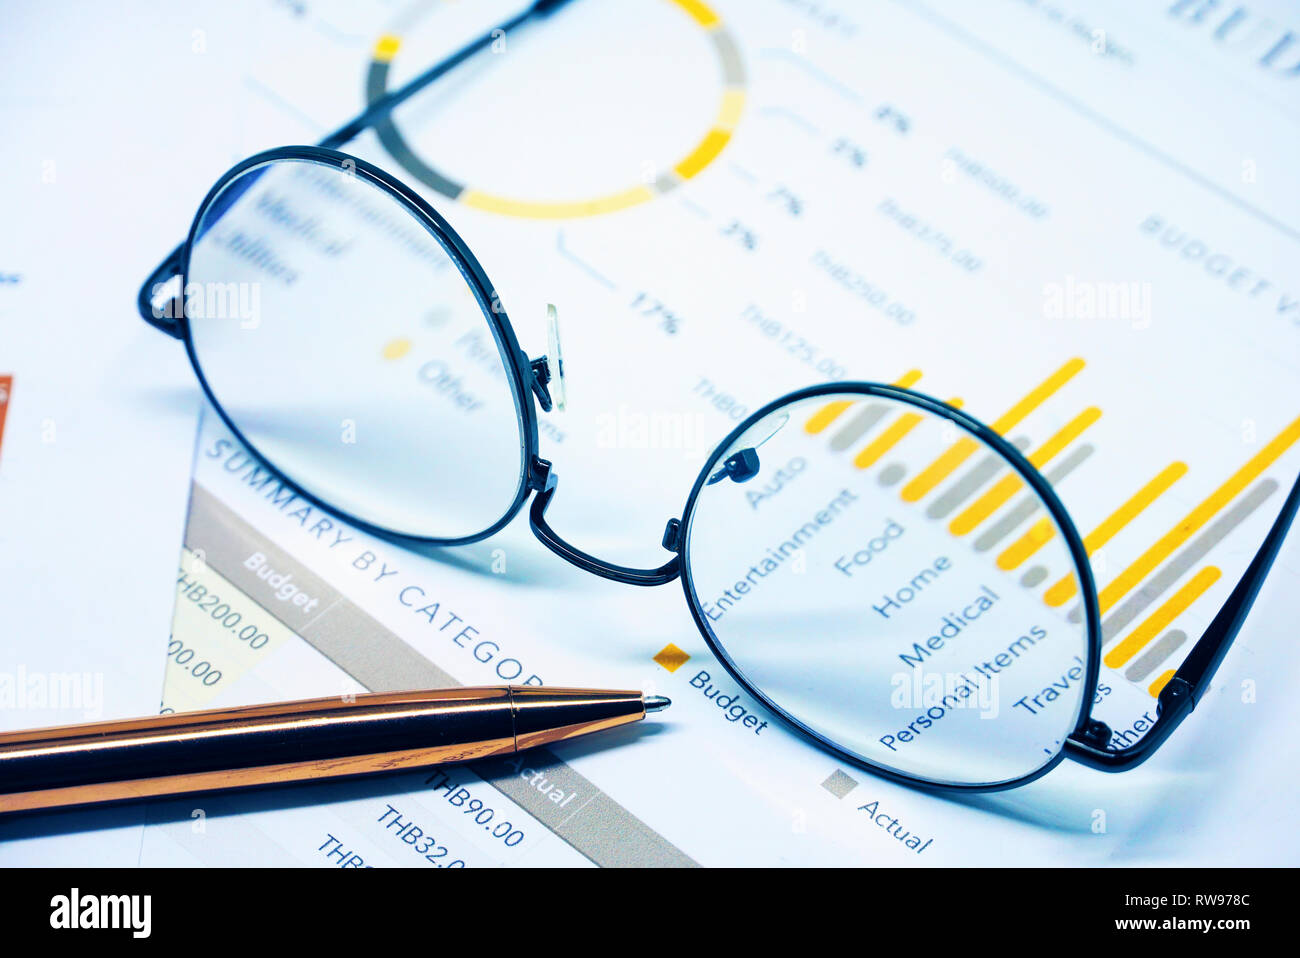 Eyeglasses on finance document - Stock Image